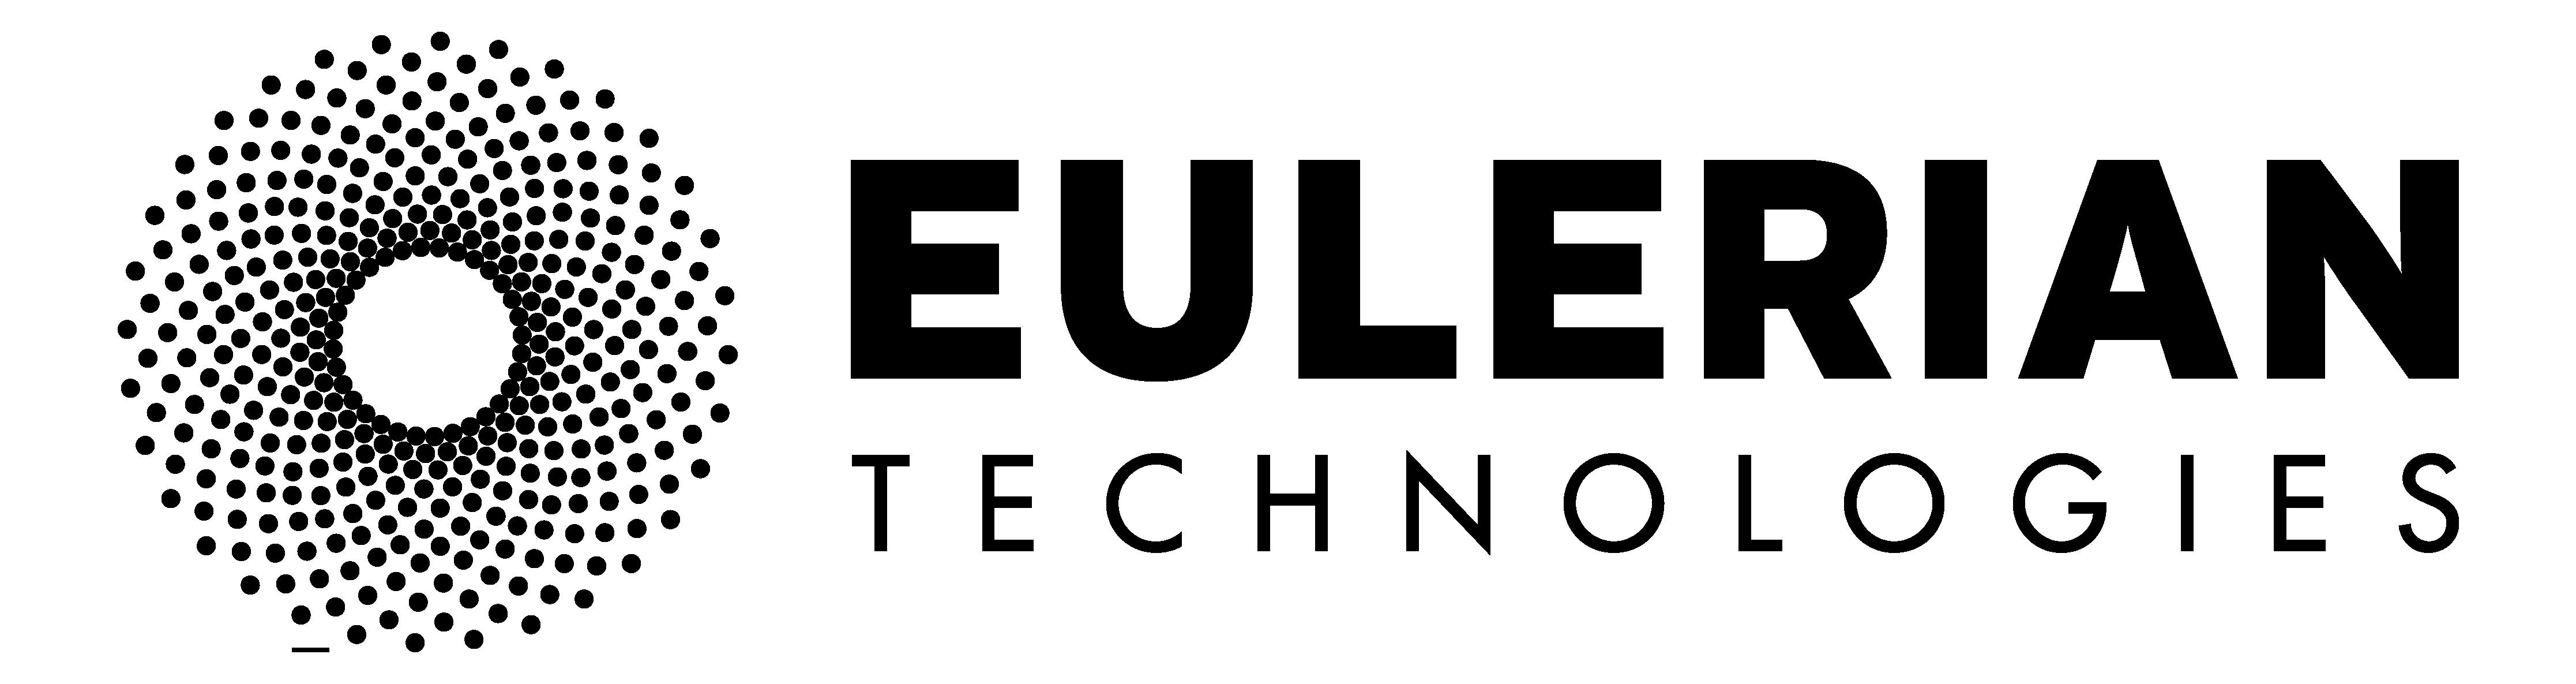 logo-header-EULERIAN-noir-fond-transparent.png